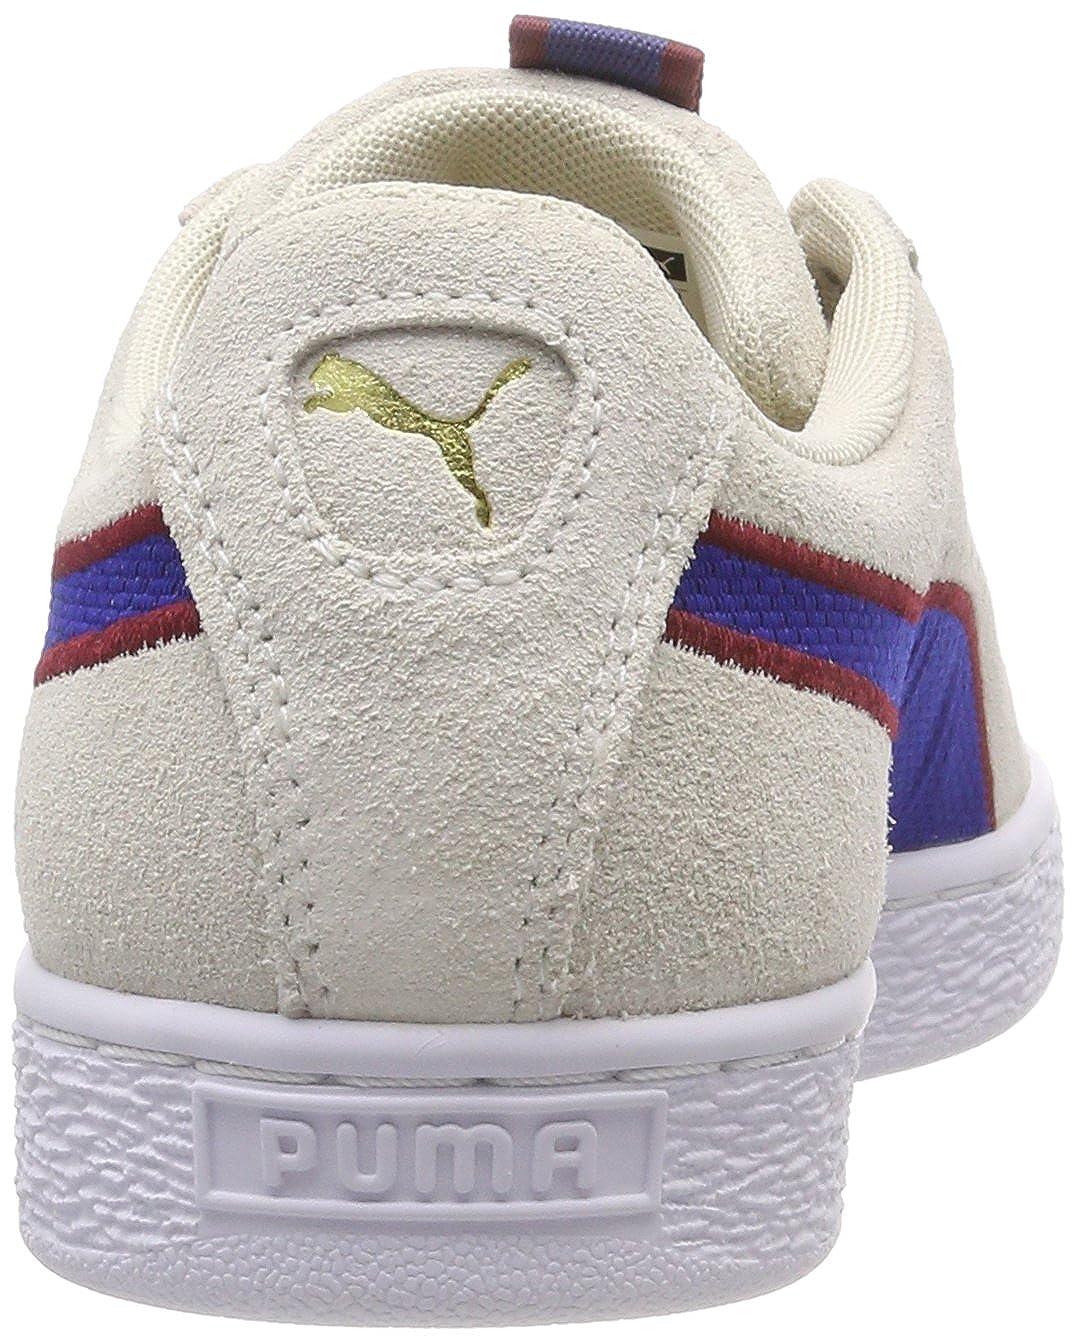 Puma Suede Classic Sport Stripes, Sneakers Basses Mixte Adulte